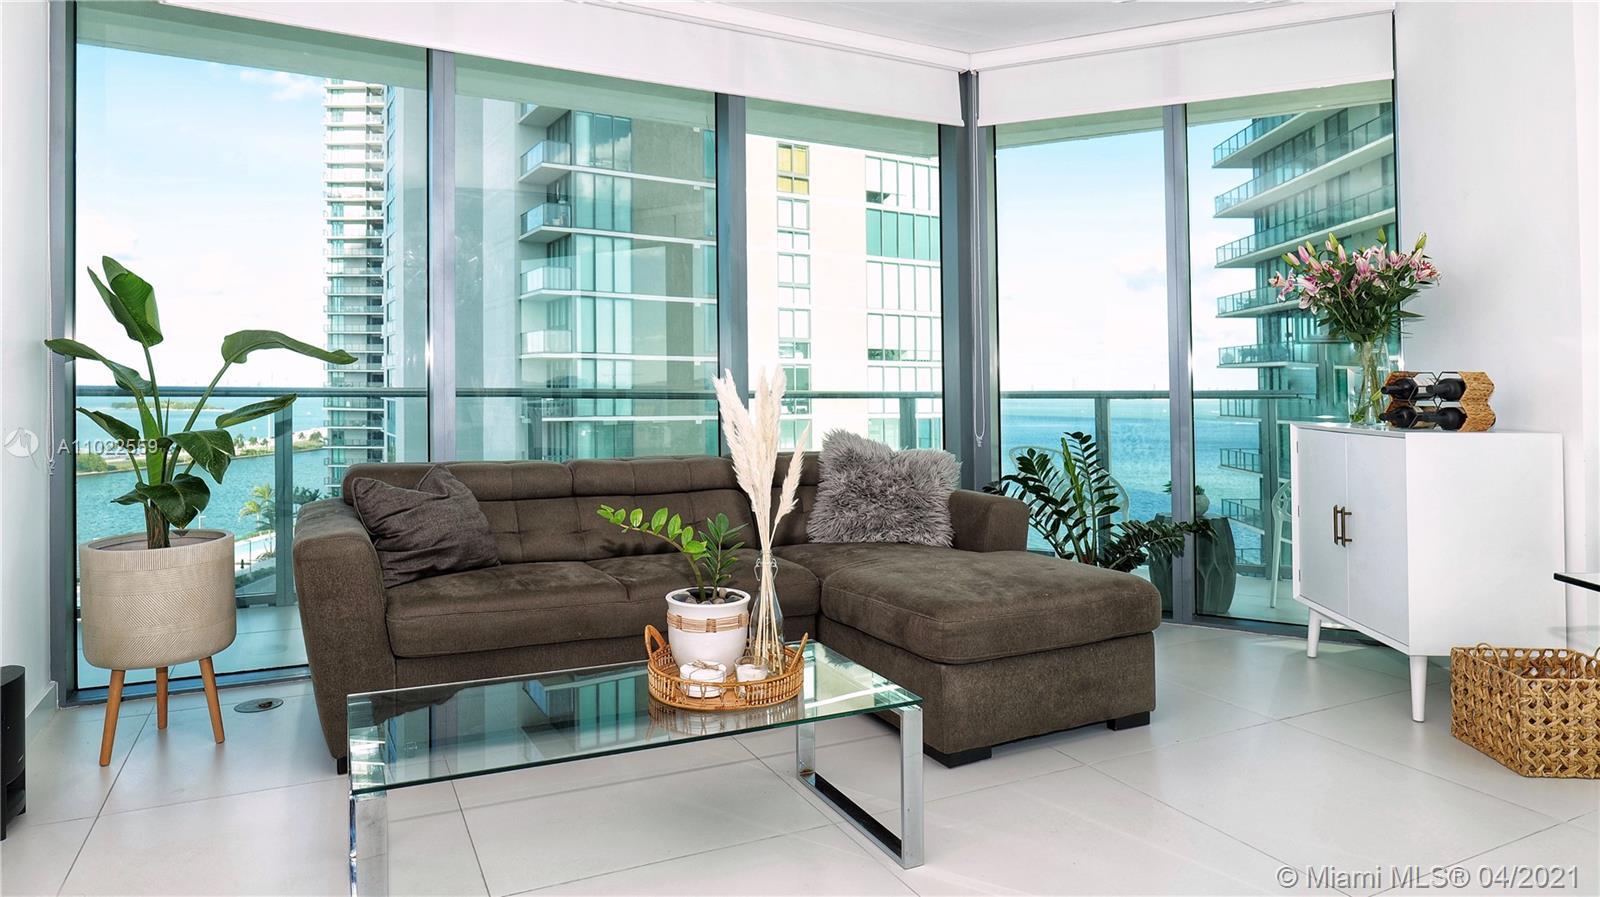 Paraiso Bayviews #1506 - 501 NE 31st St #1506, Miami, FL 33137